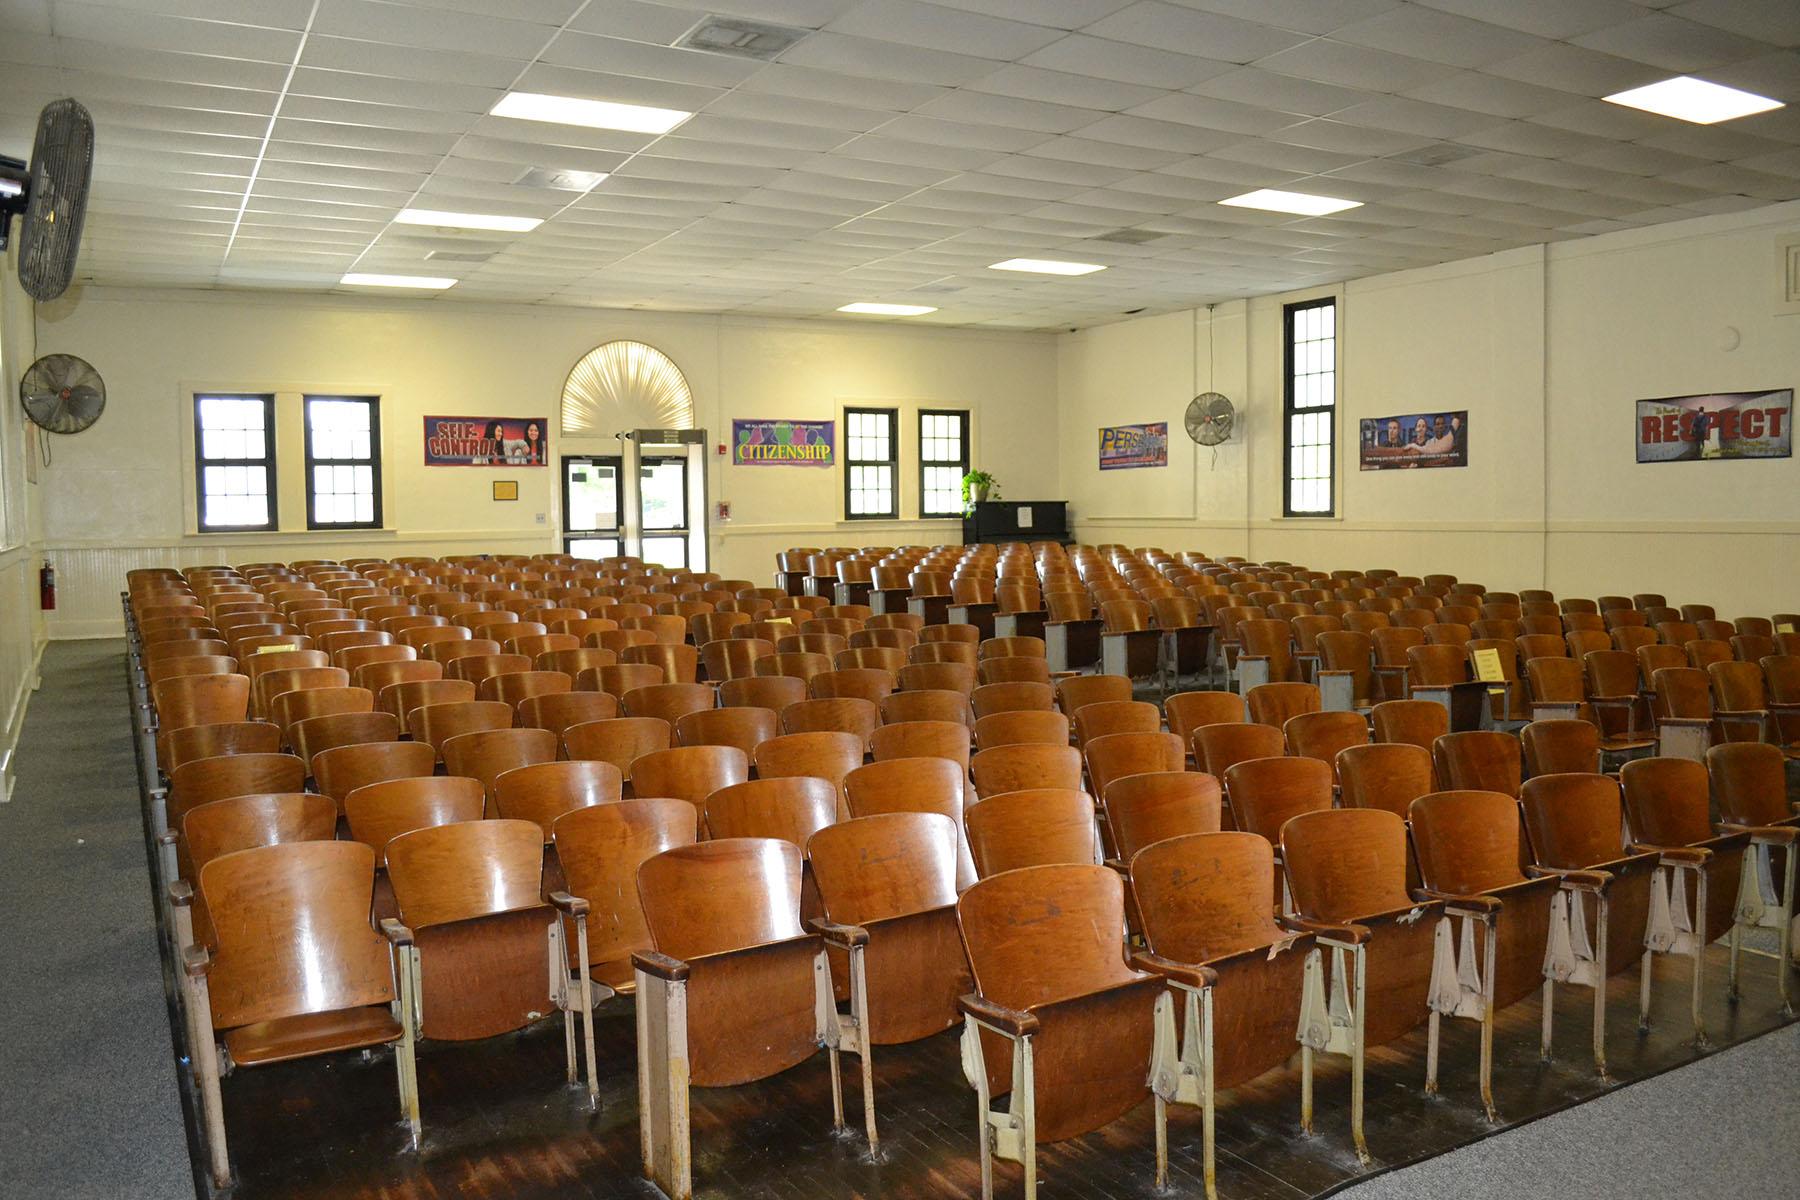 Blythewood School Auditorium.  Photo taken by Jim McLean August 2014.